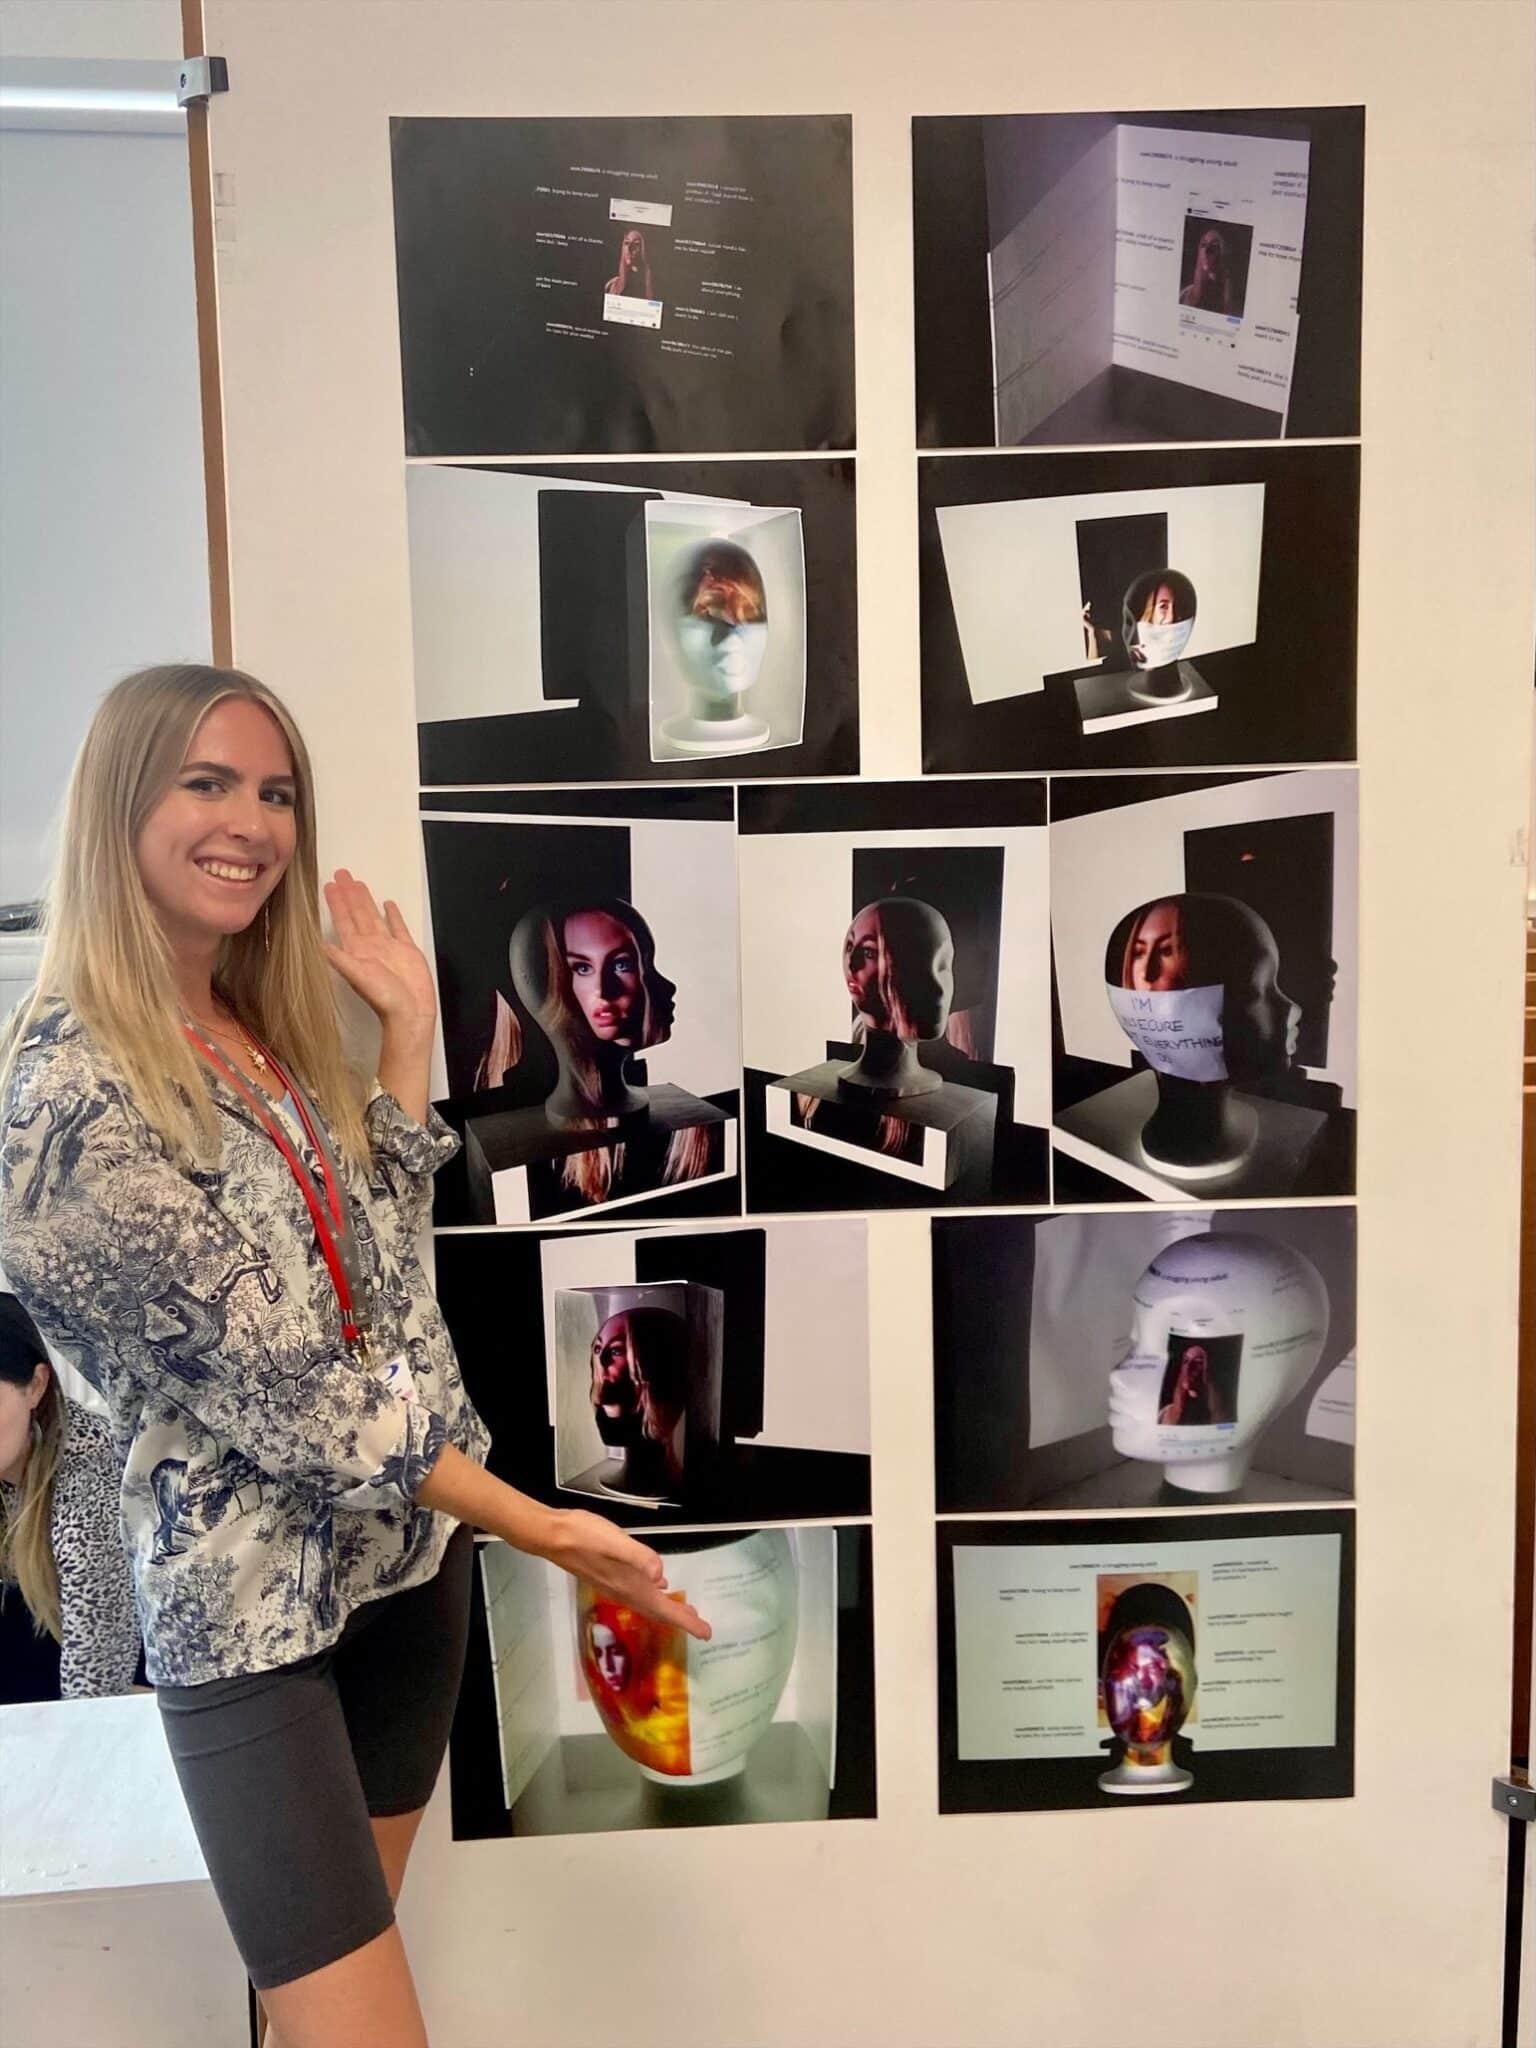 Eleanor displaying her work